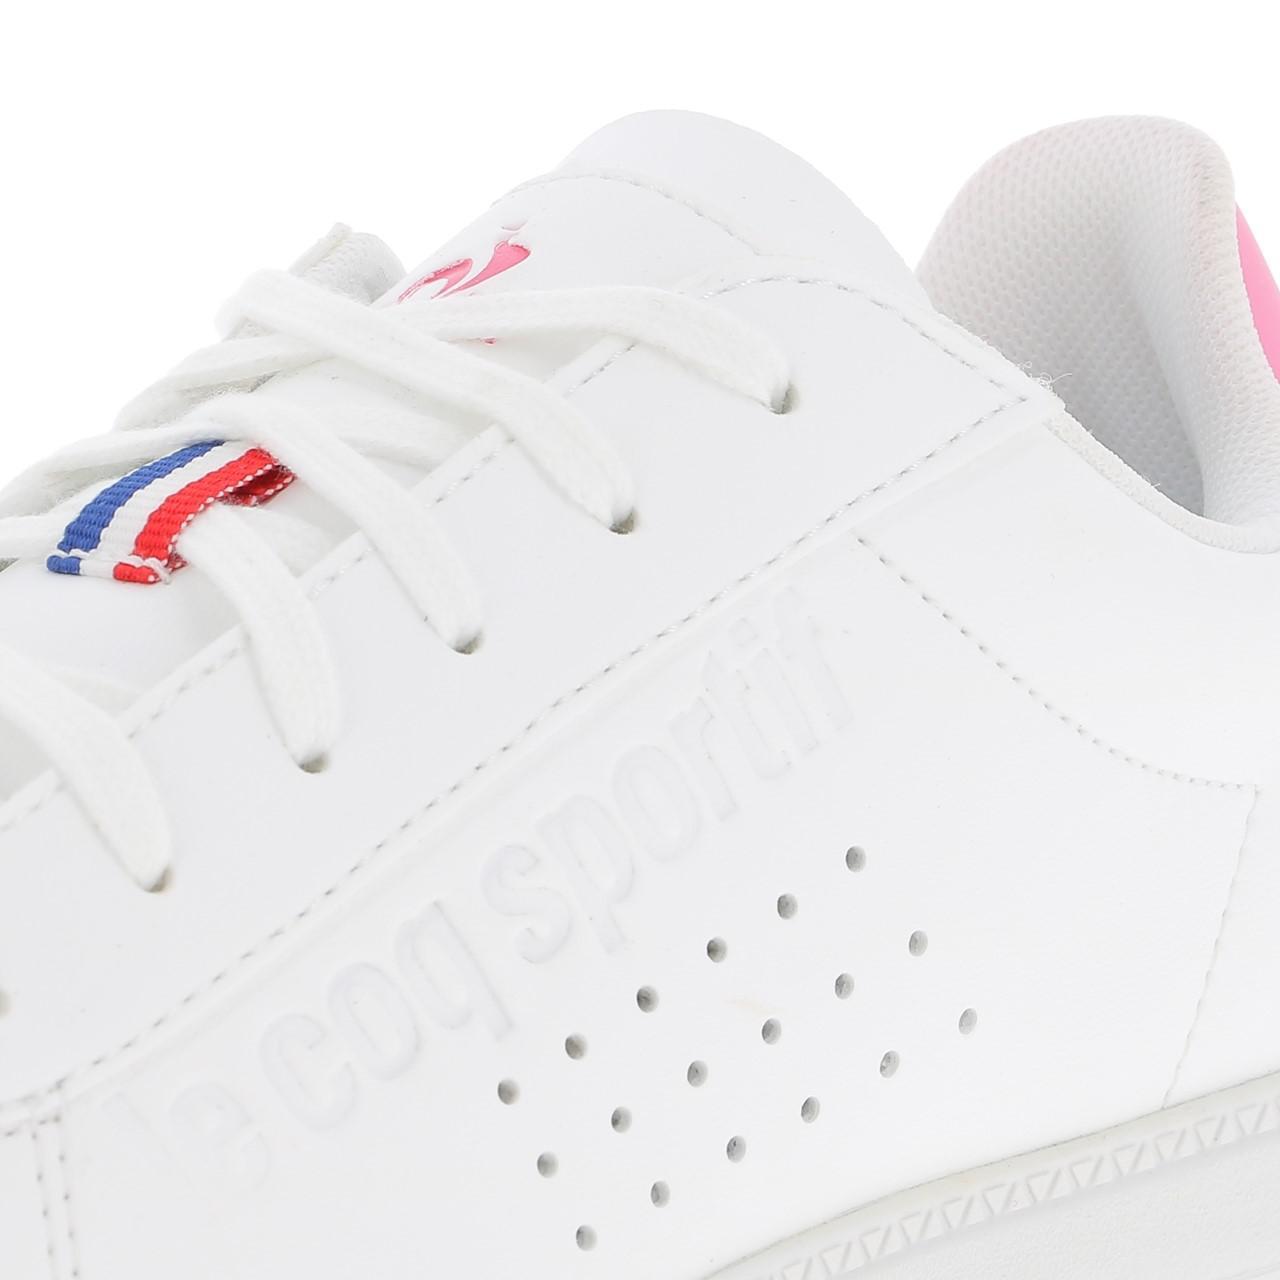 Schuhe-Niedrig-Leder-oder-Faux-Le-Coq-Sportif-Courtset-Maedchen-Blc-Weiss-47681 Indexbild 2